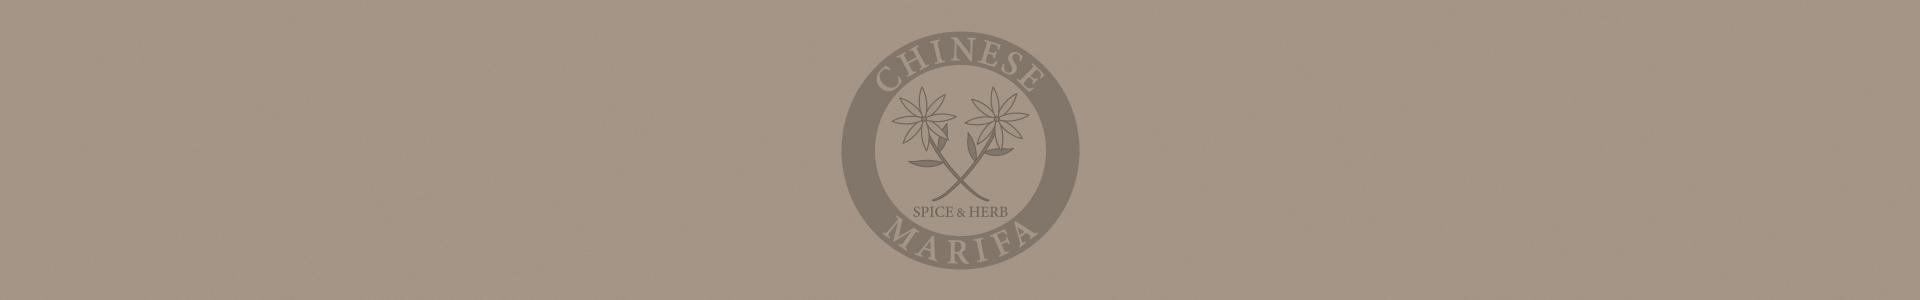 CHINESE マリファ